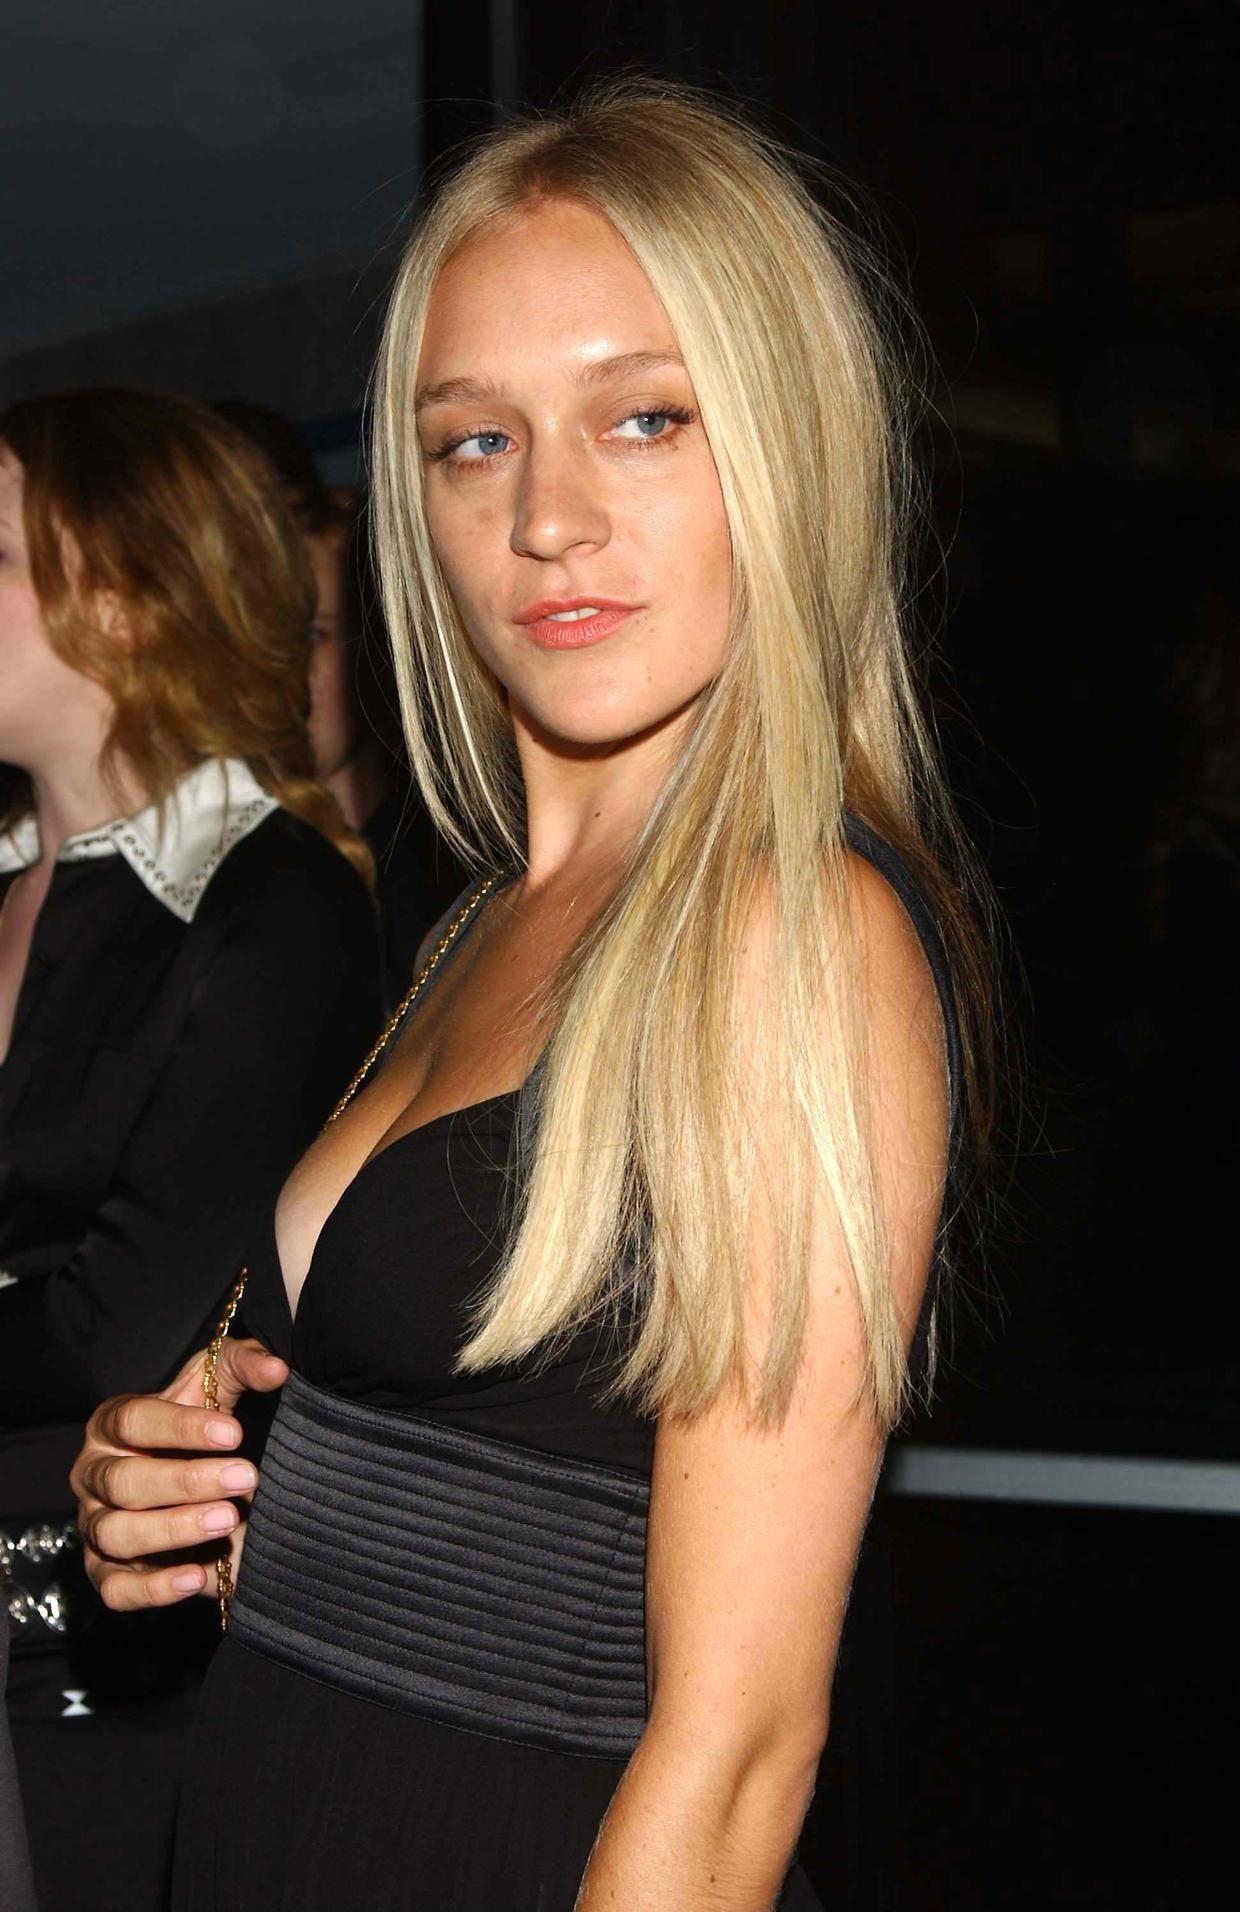 Chloe sevigny born american actress